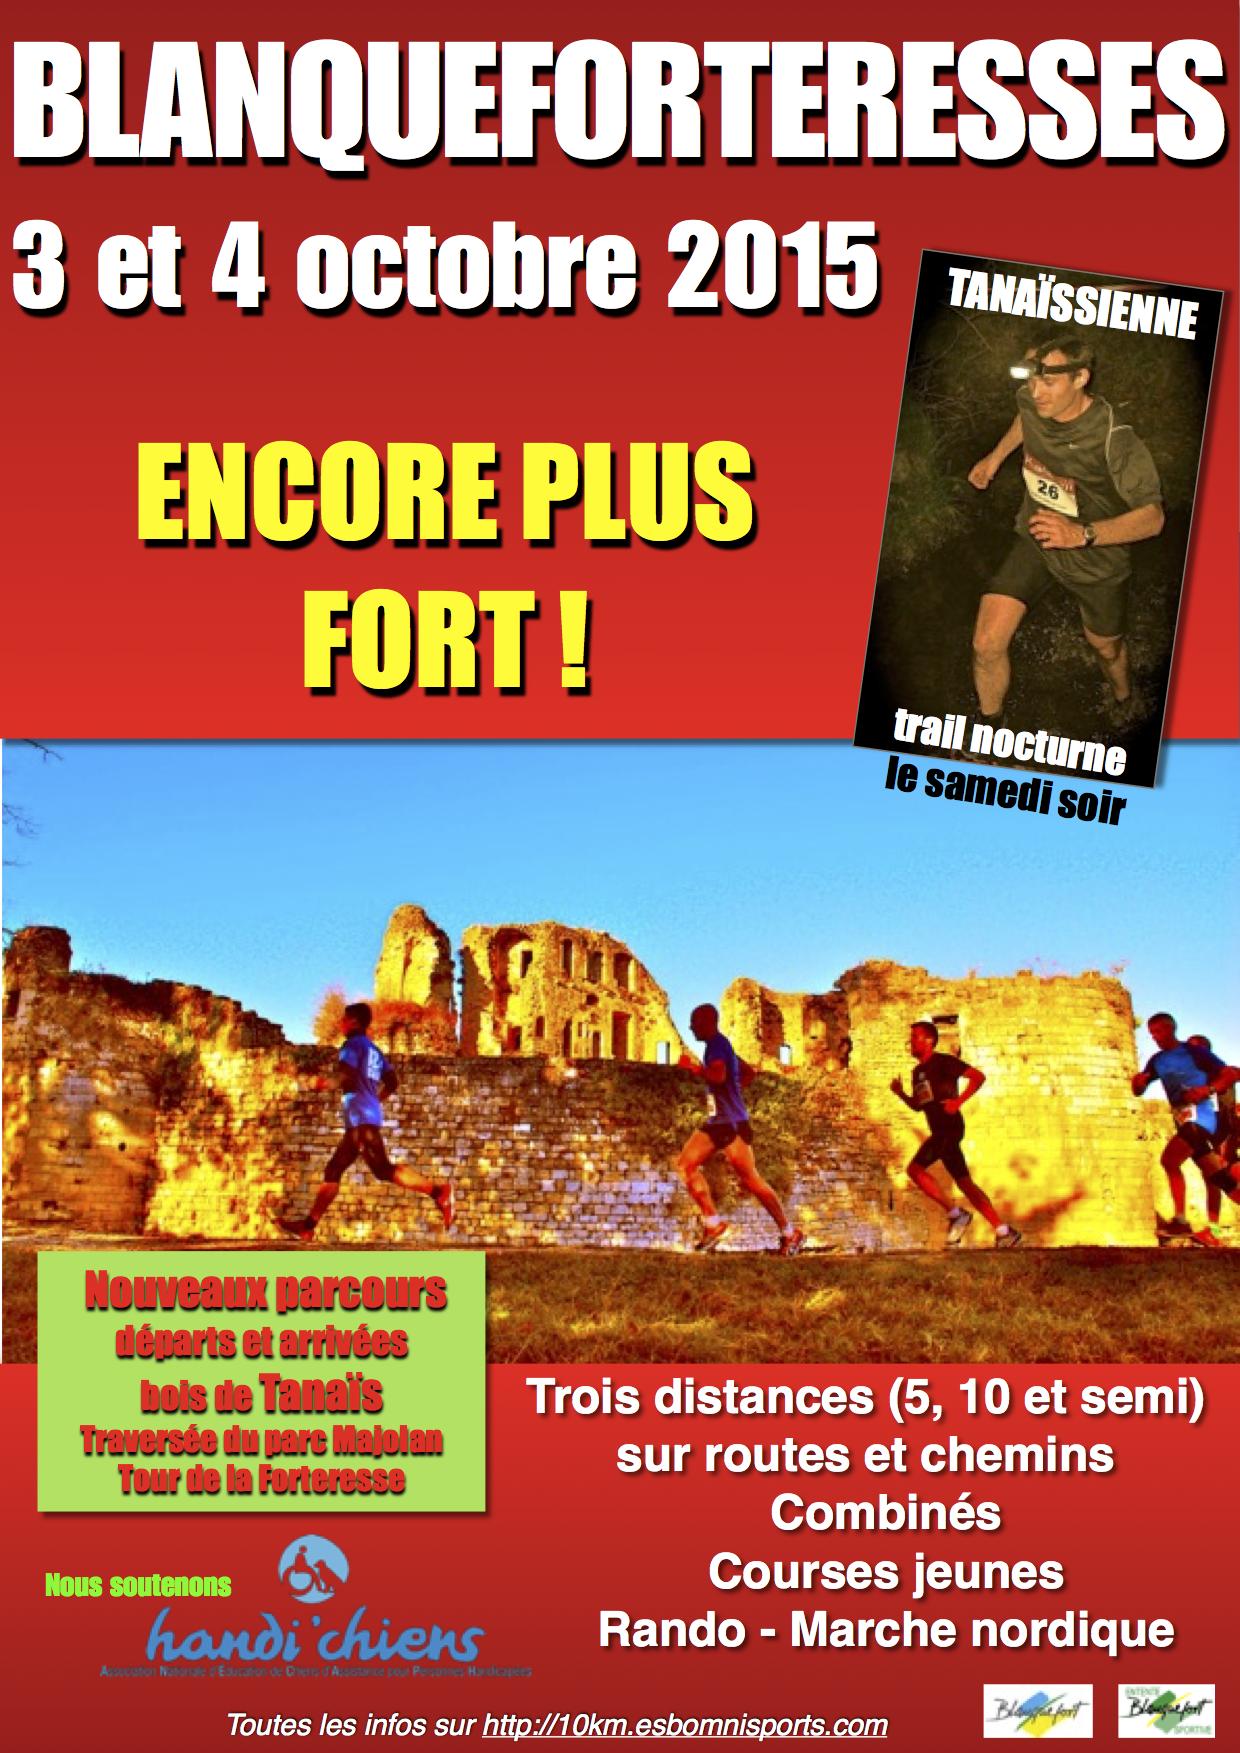 http://10km.esbomnisports.com/